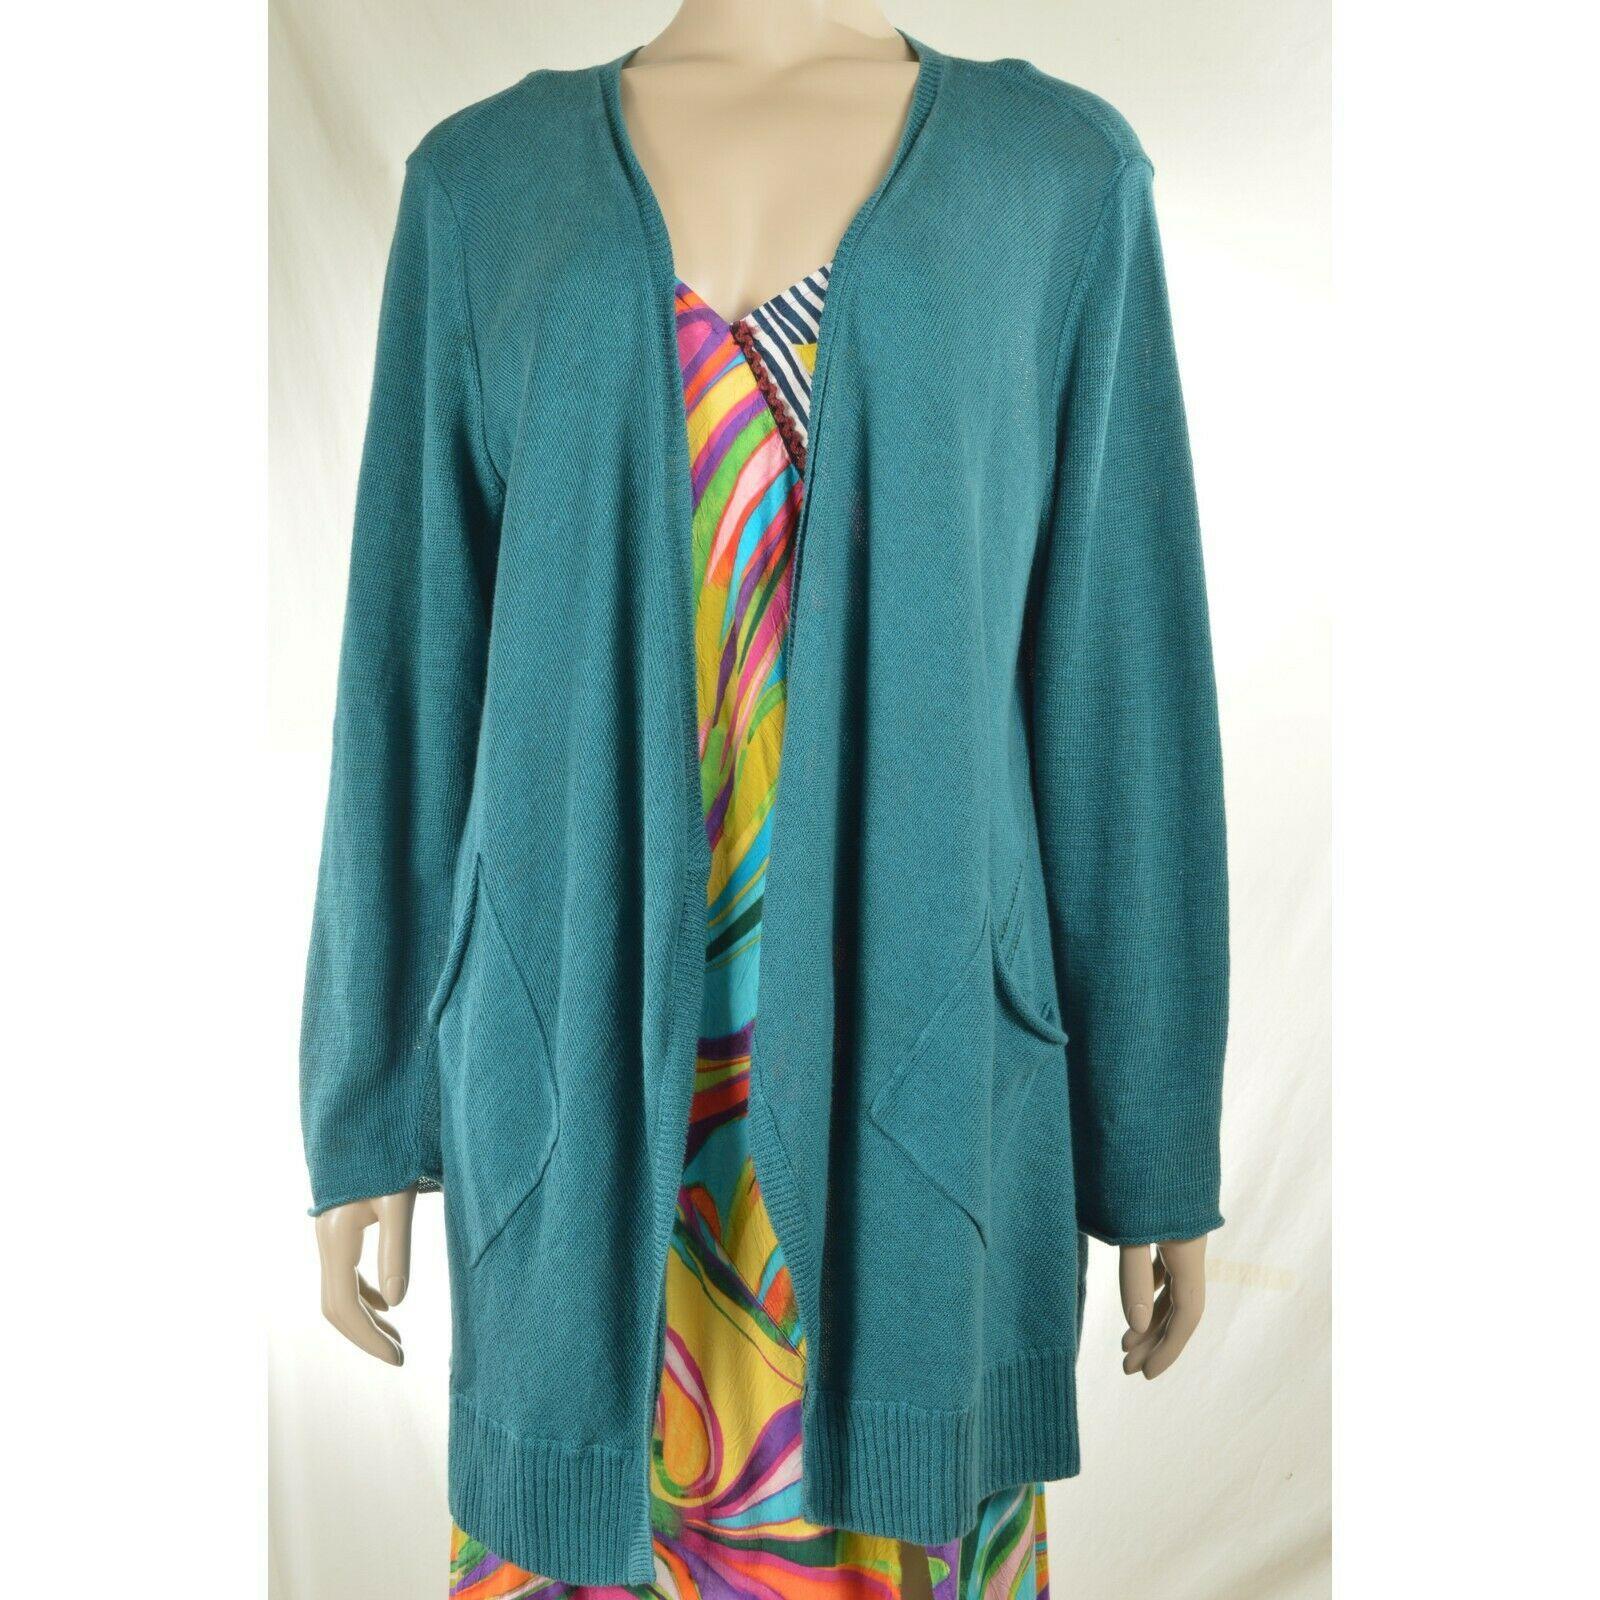 Eileen Fisher sweater cardigan SZ L teal 100% linen knit pockets soft long s image 12